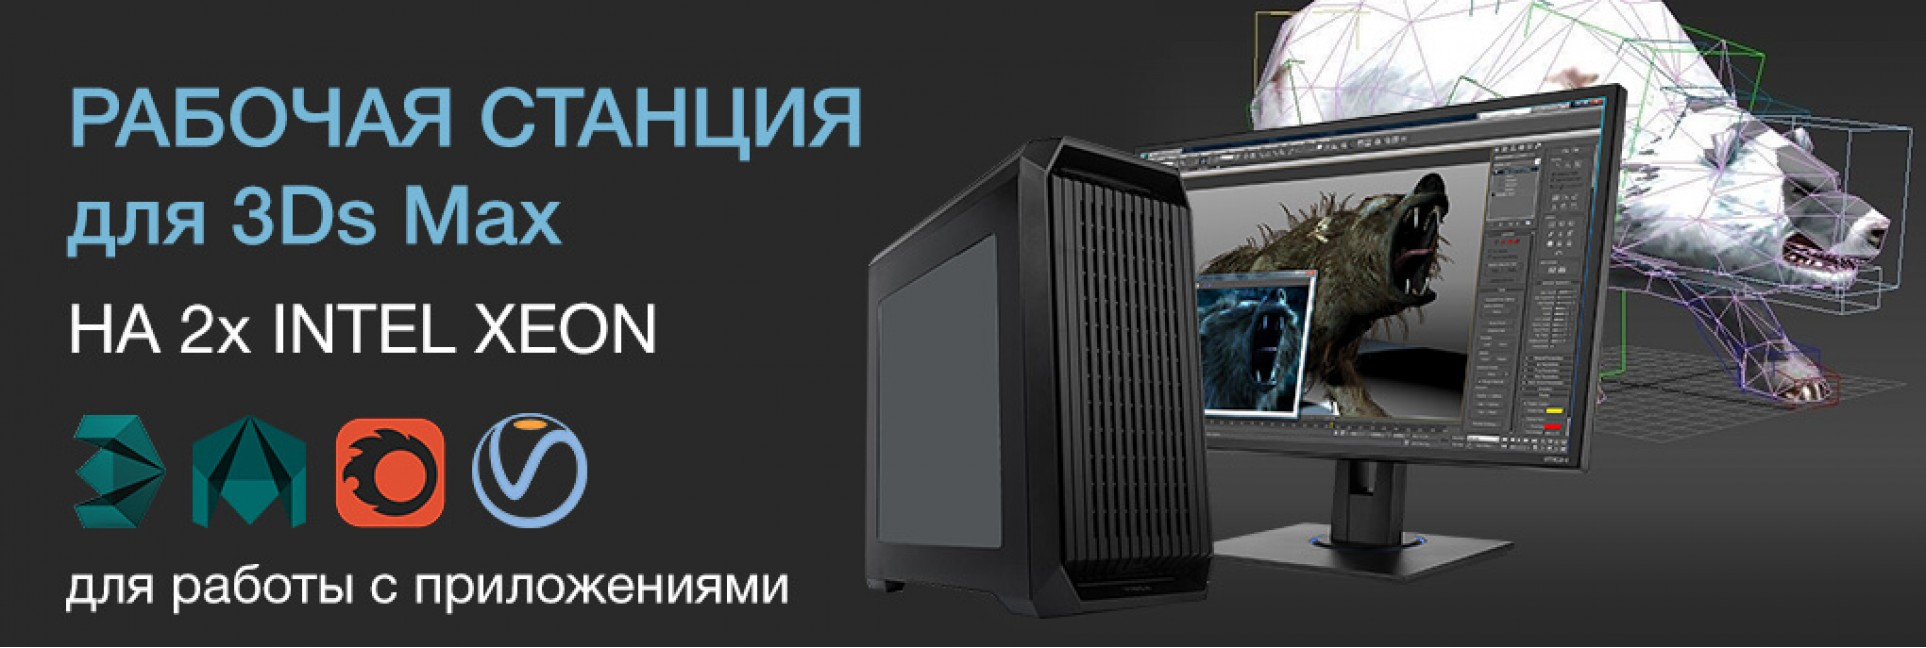 Рабочая станция для 3Ds Max